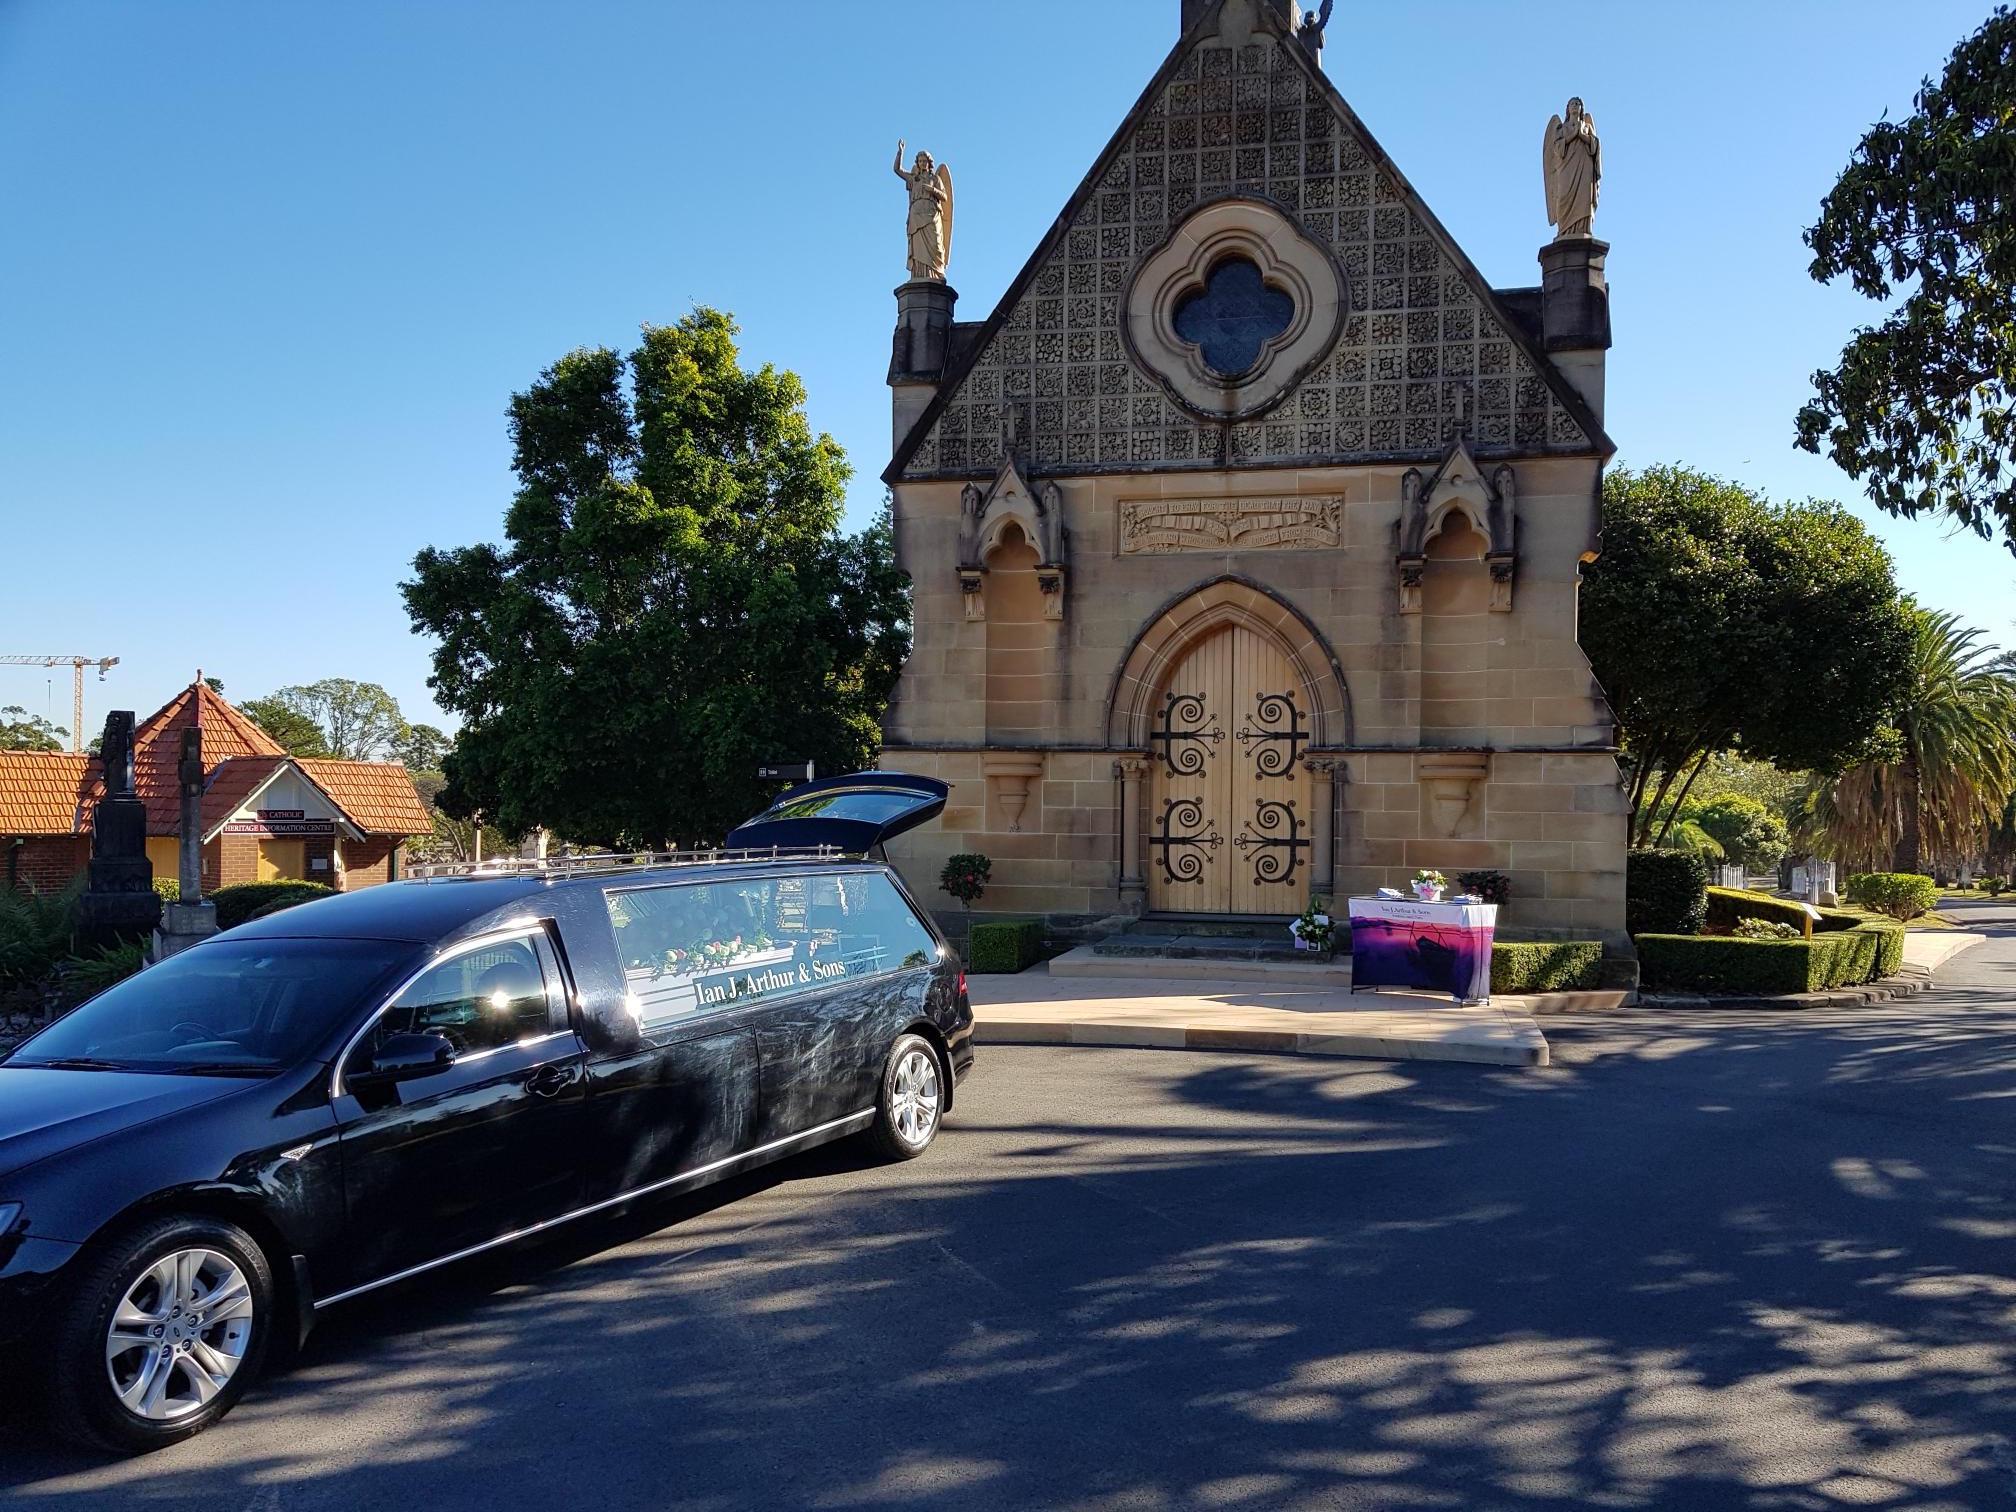 St-Michael-the-Archangel-Chapel-at-Rookwood.jpg